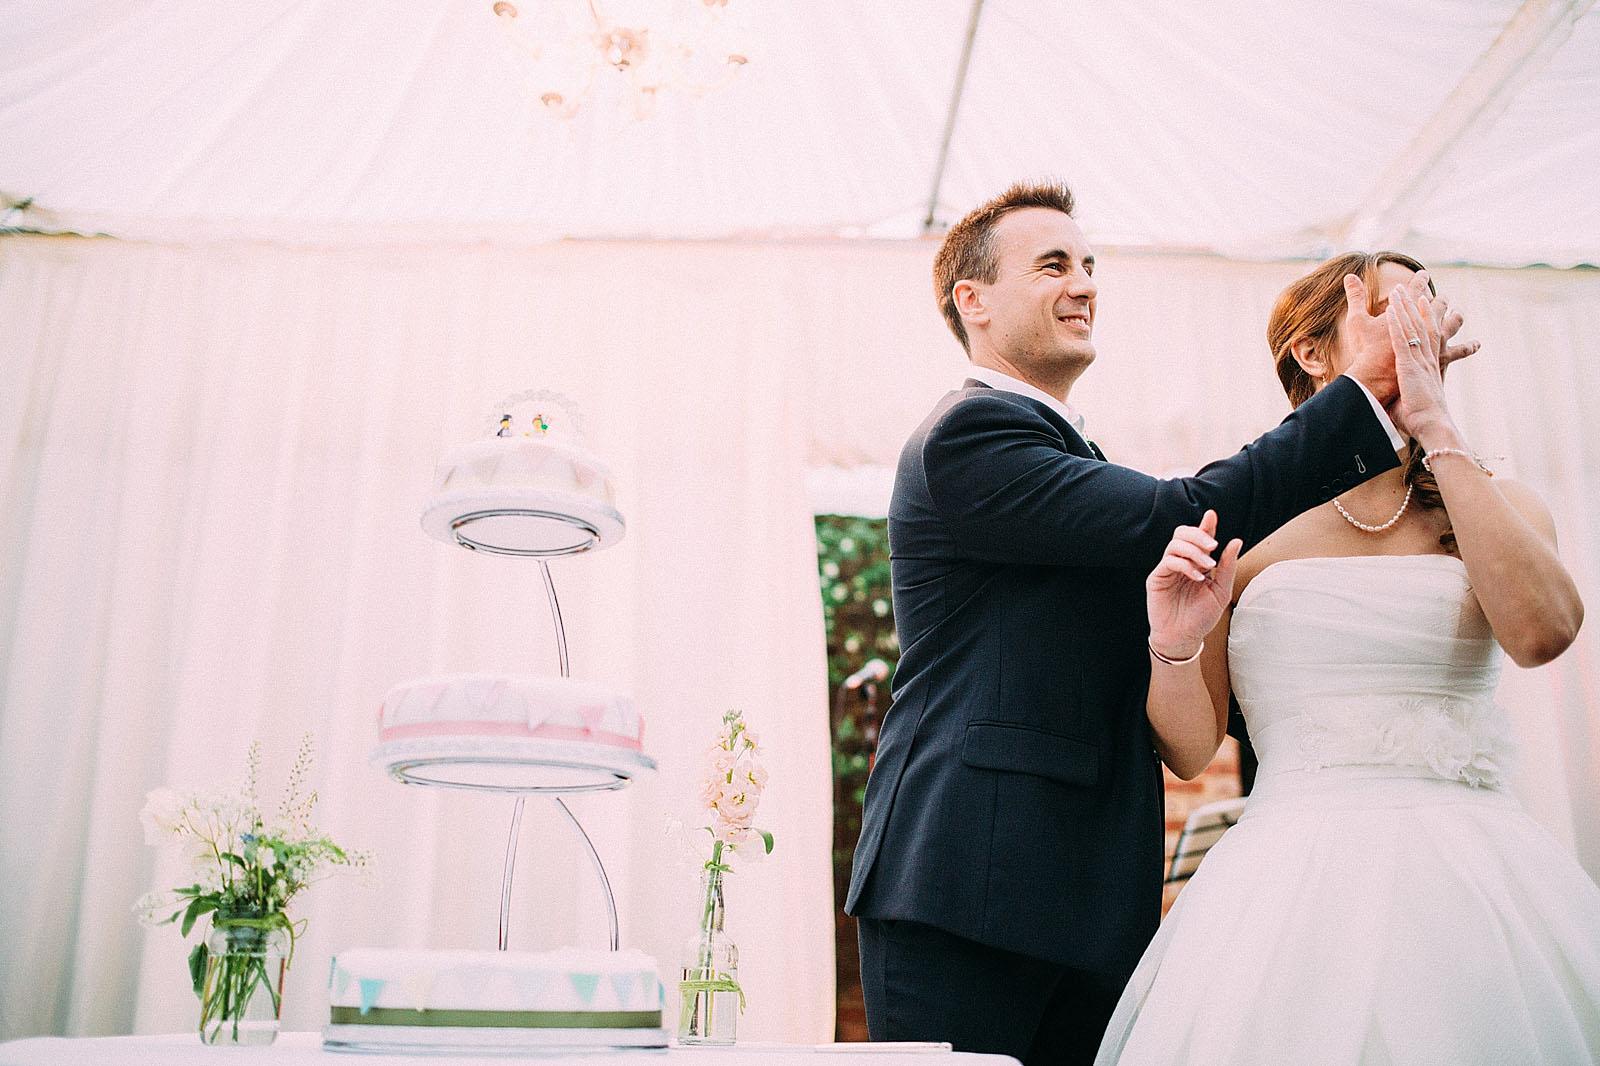 Lawson_Best_Wedding_2015_053